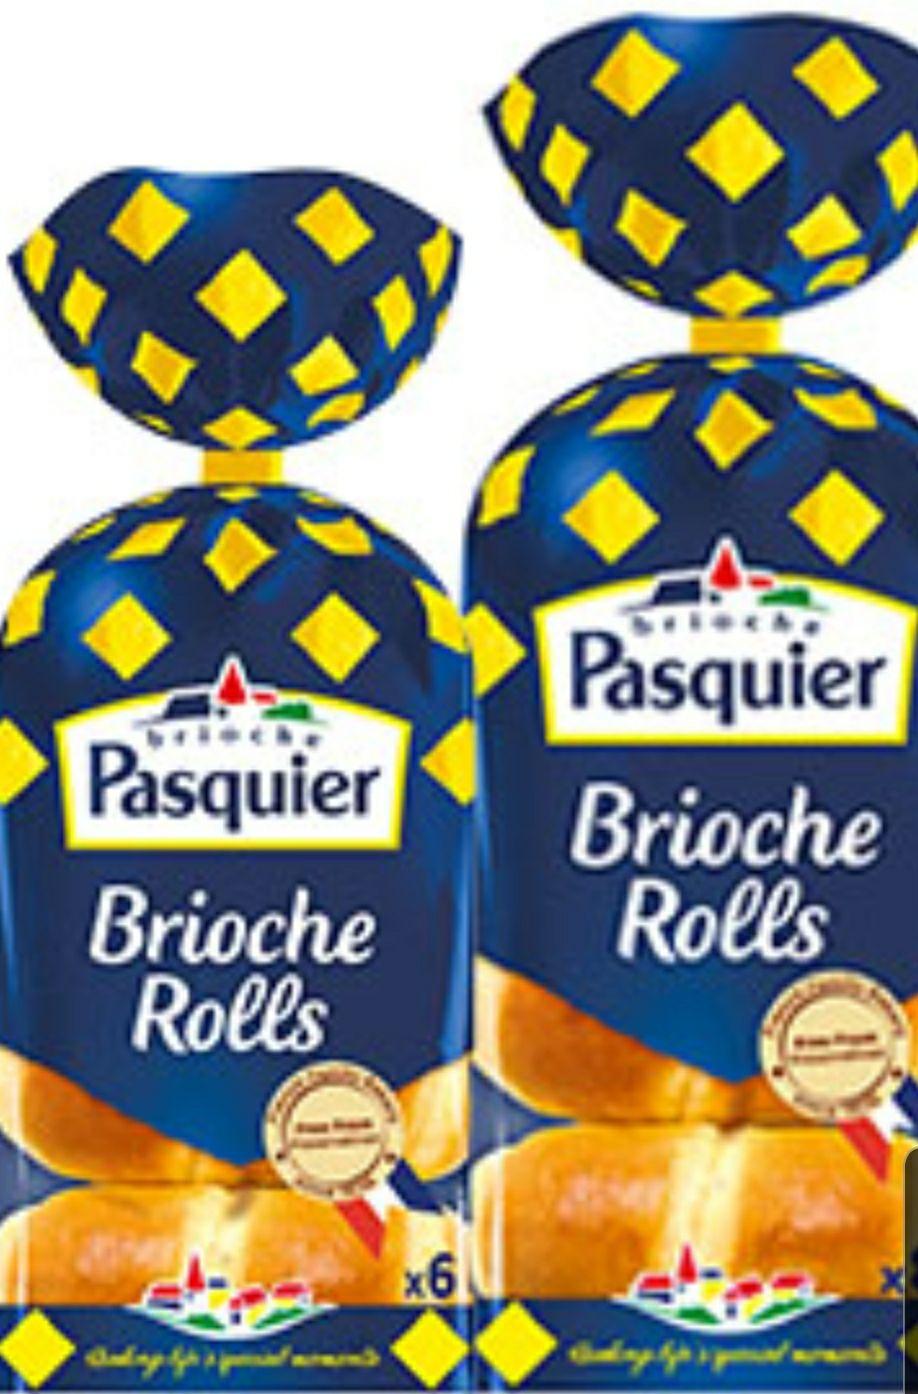 Pasquier Brioche roll 6 pack X 2 (12) @ Heron foods for £1